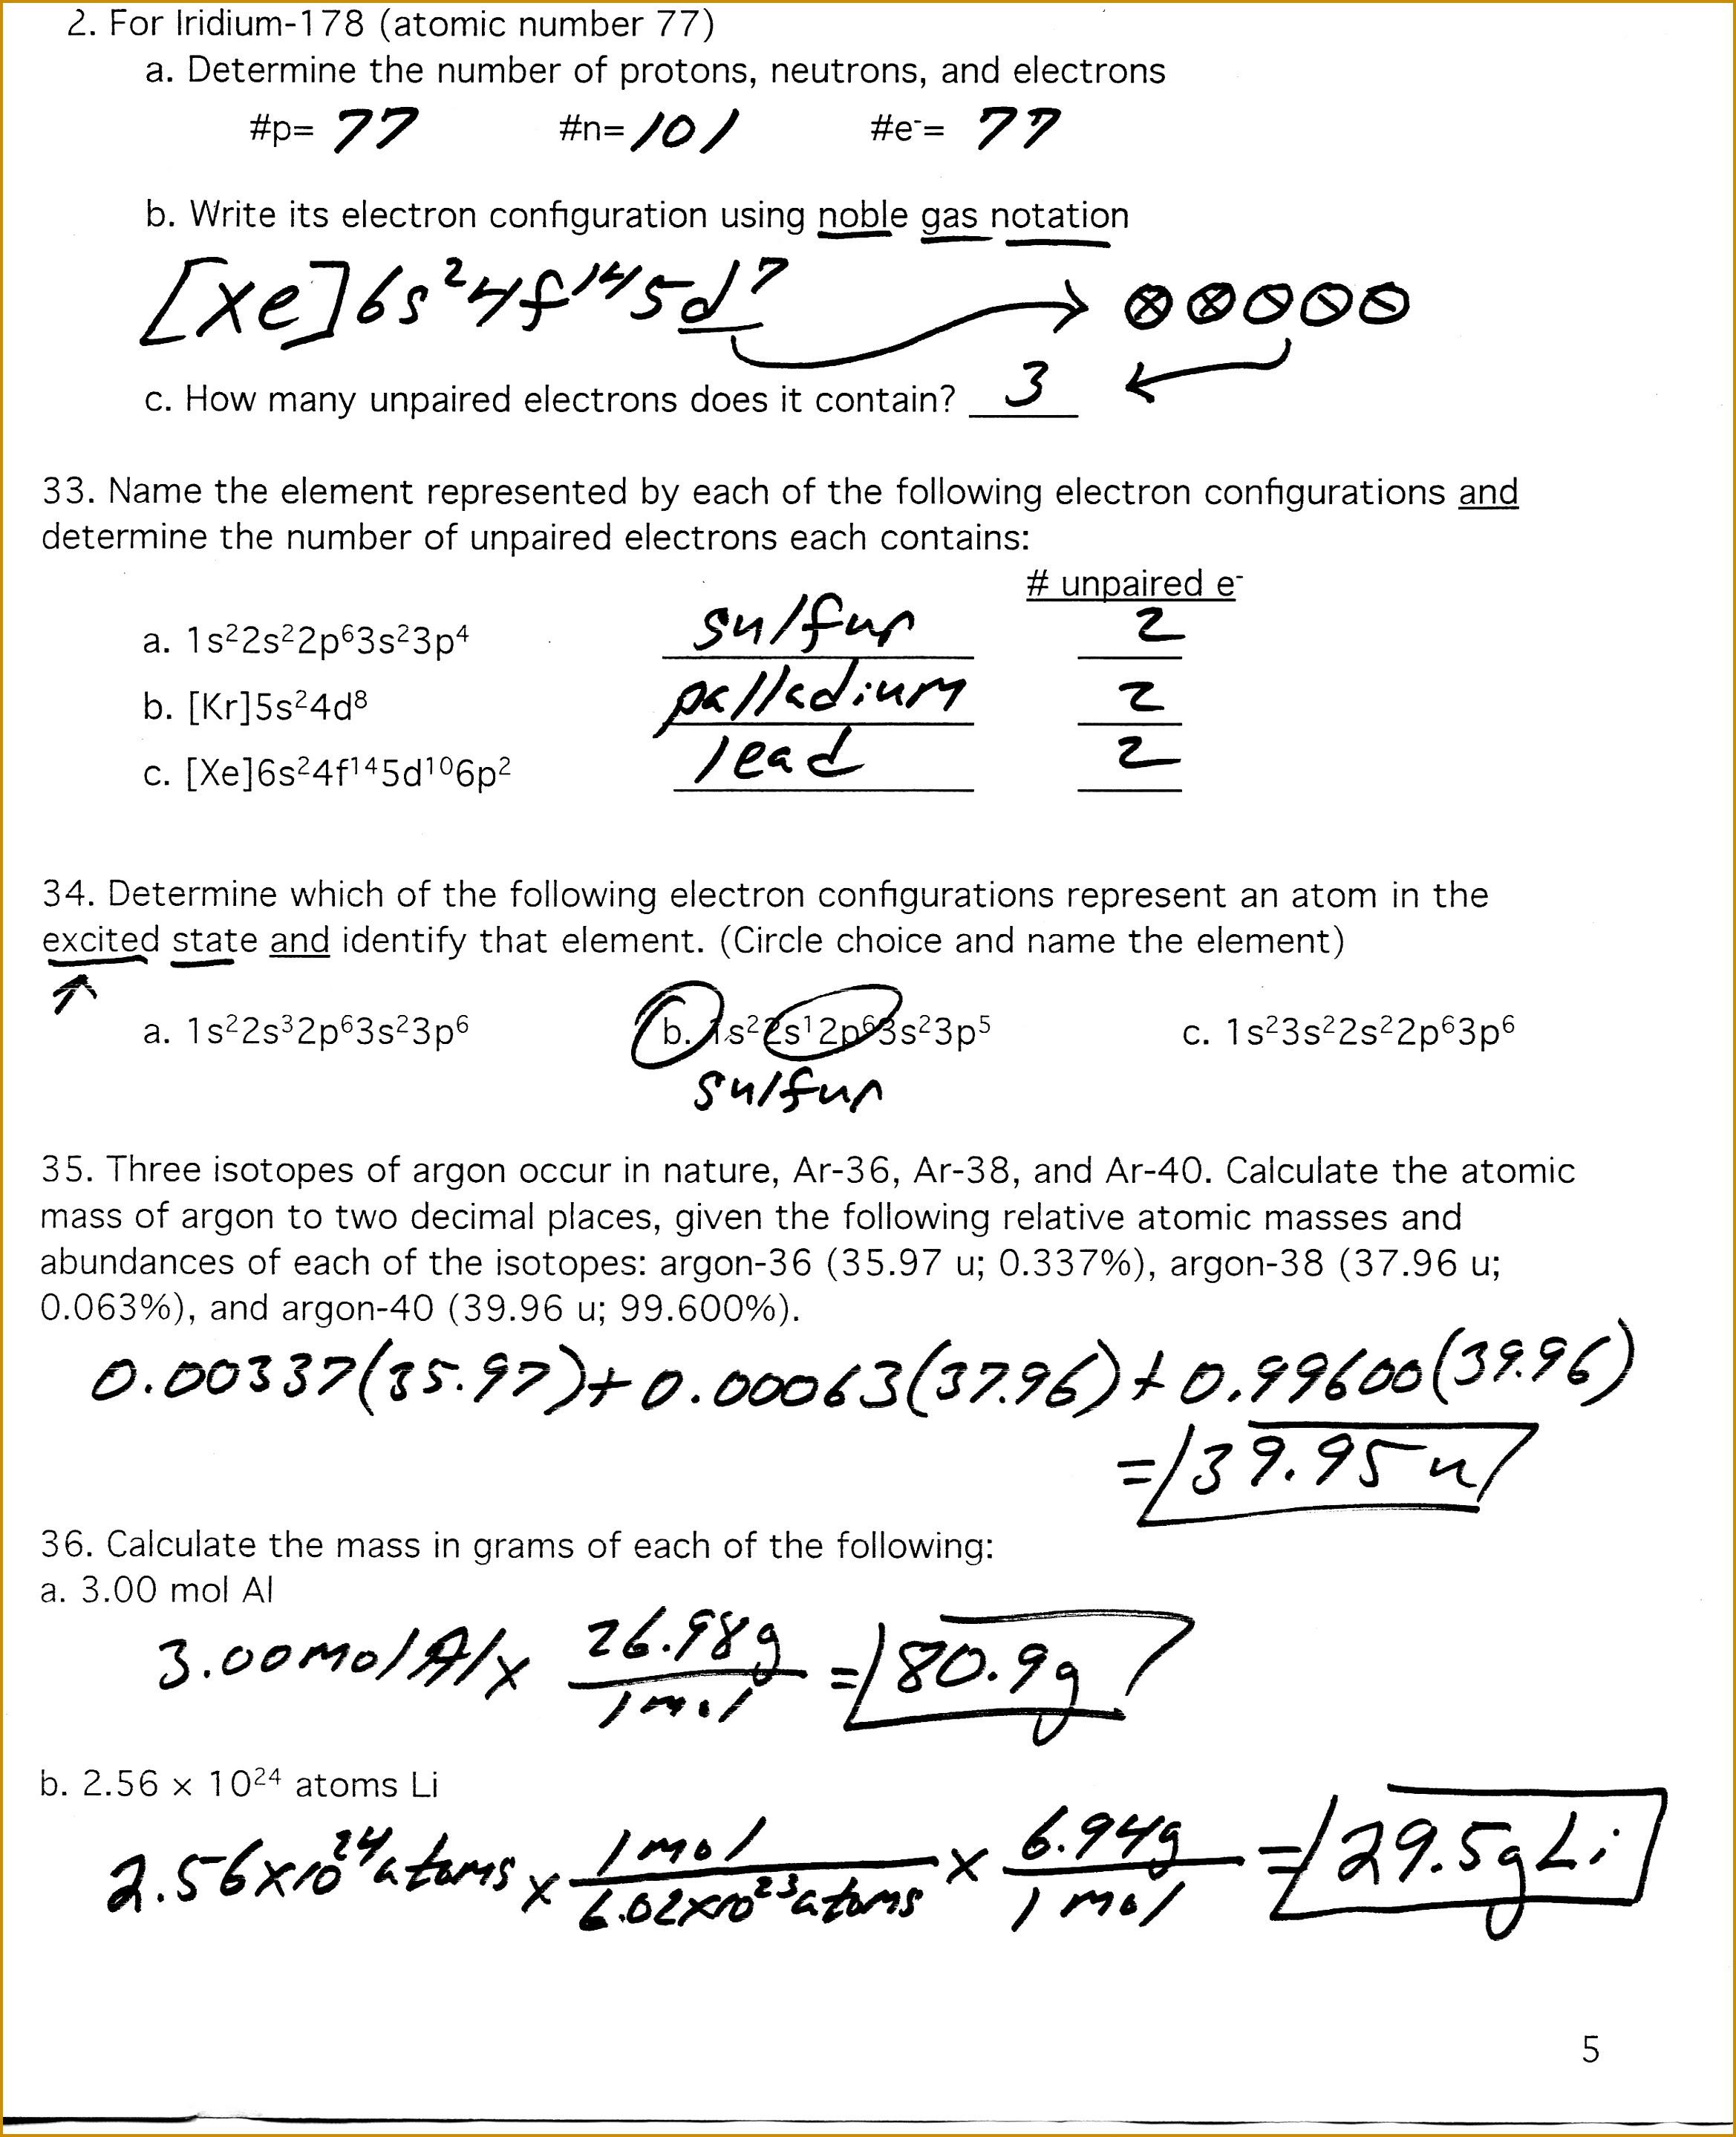 Average Atomic Mass Worksheet Answers Nidecmege